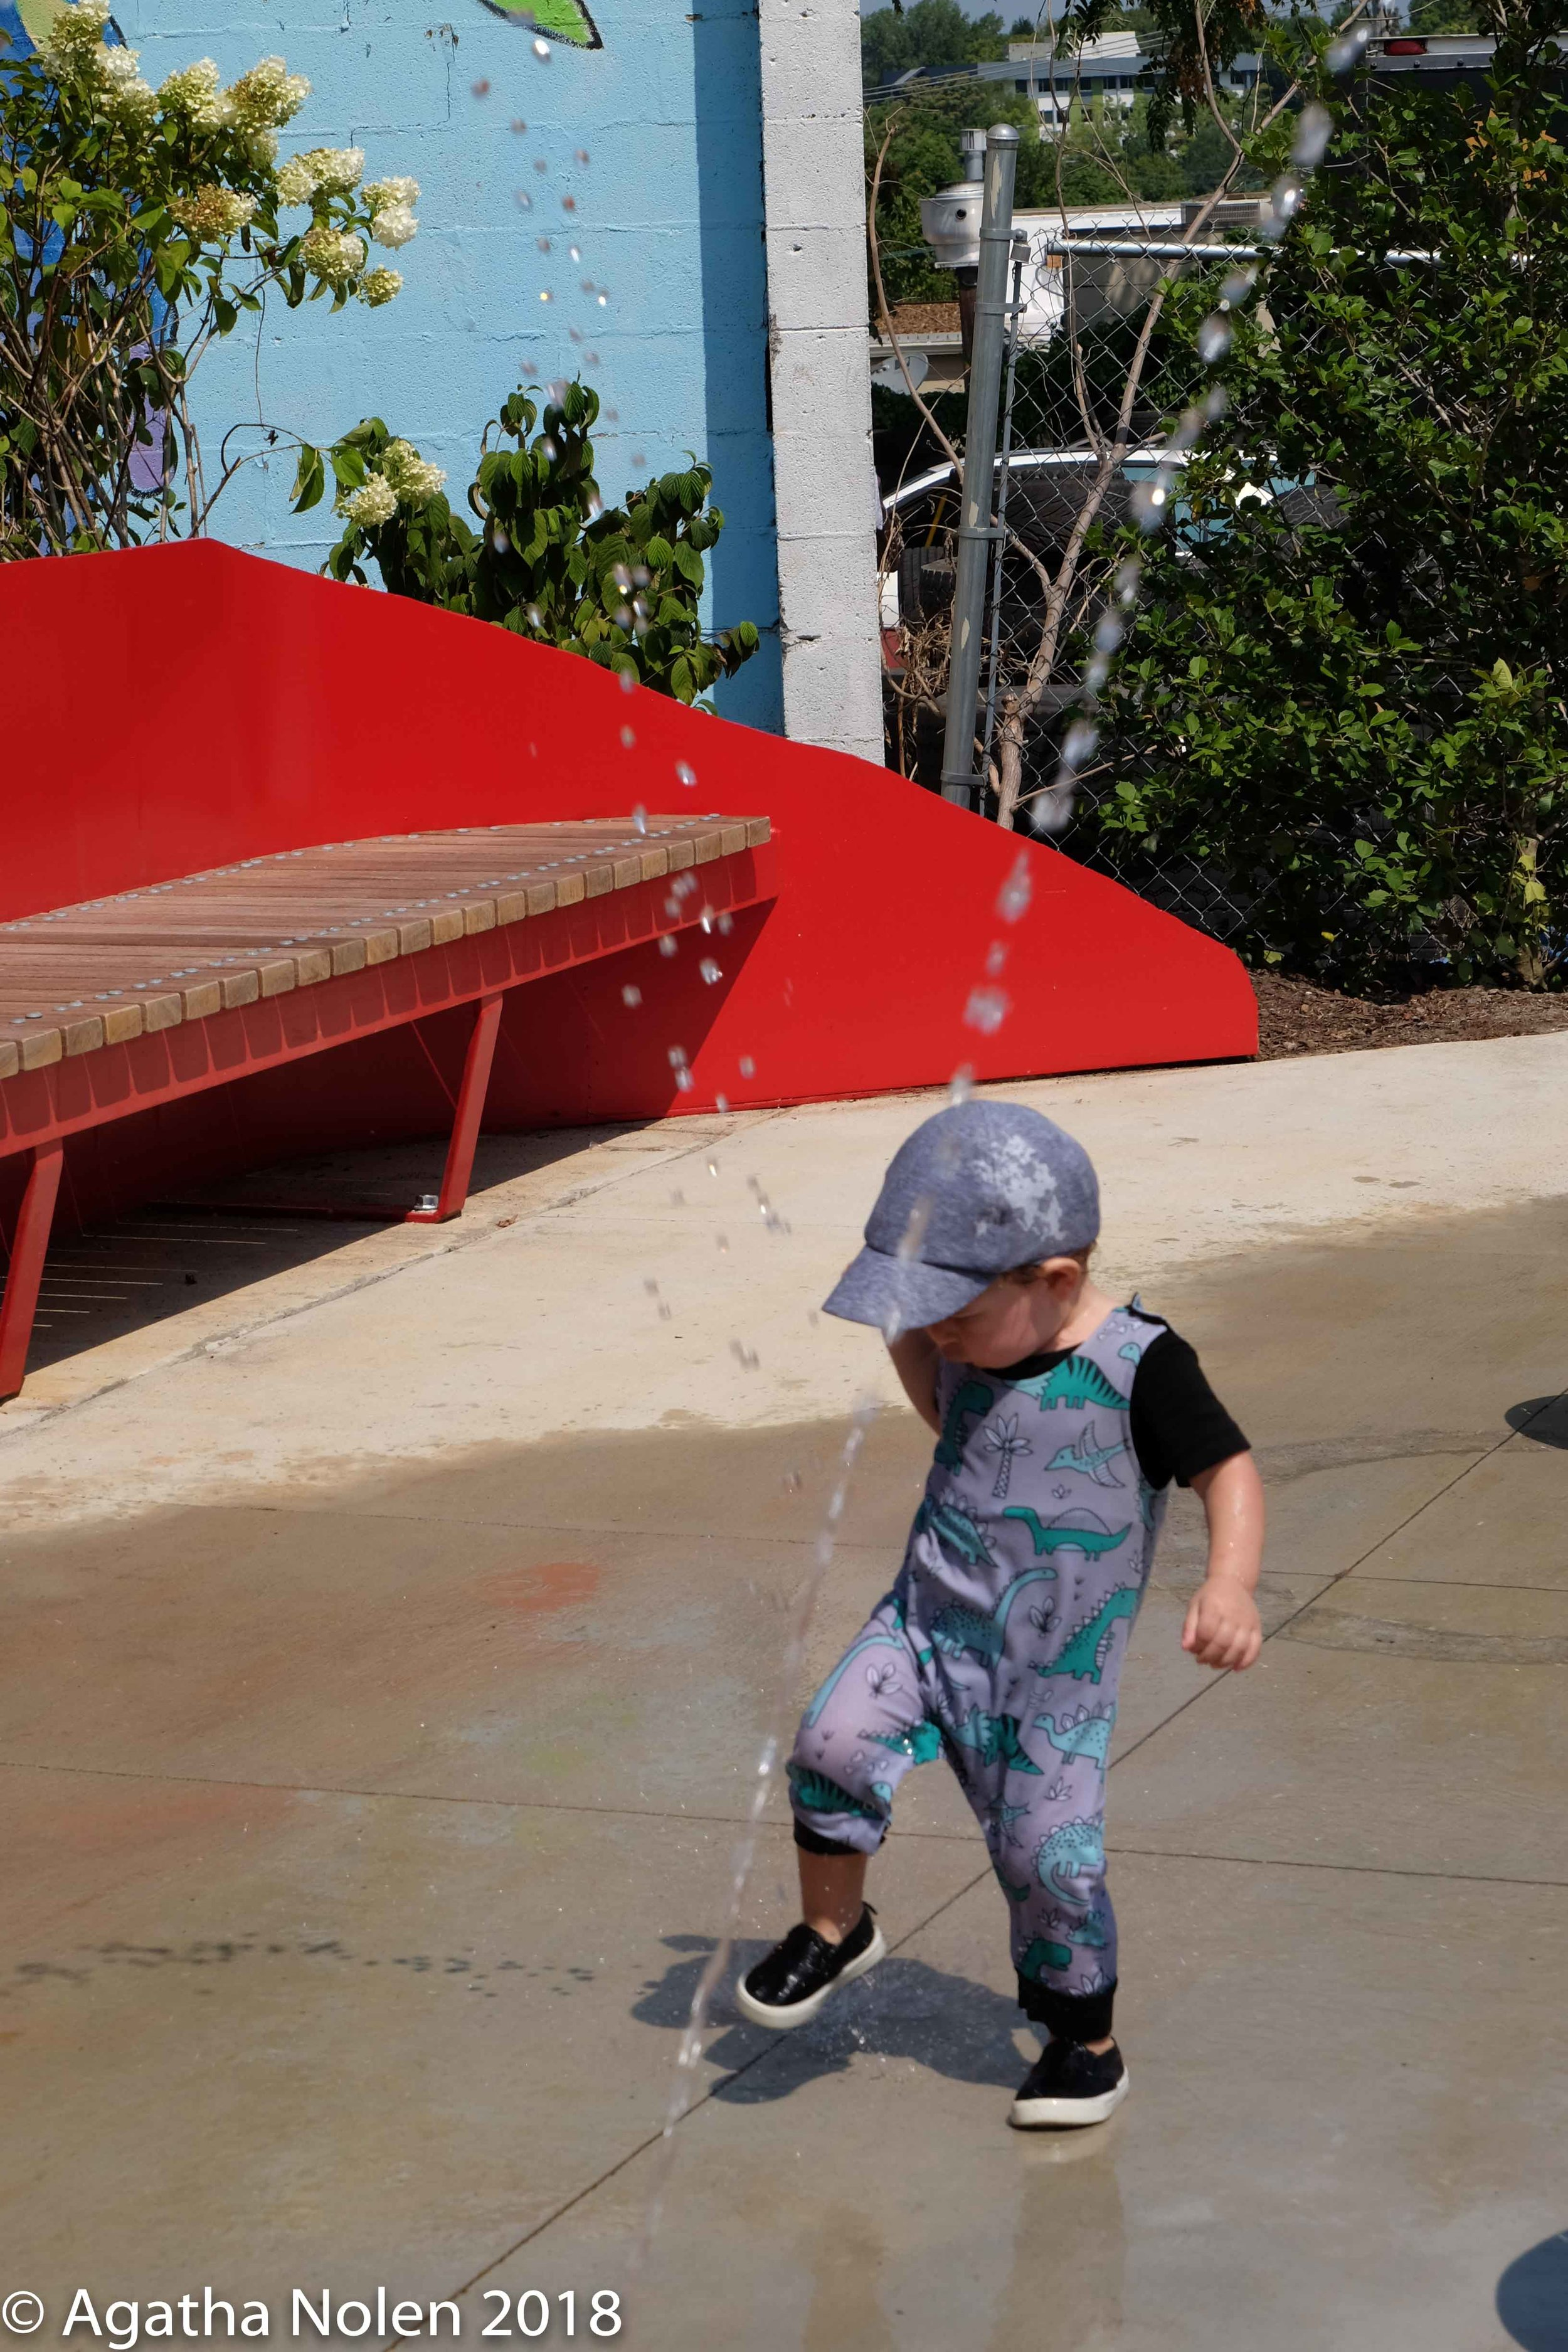 Boy playing in the waterfall at the dedication of Azafrán Park, Nashville, TN